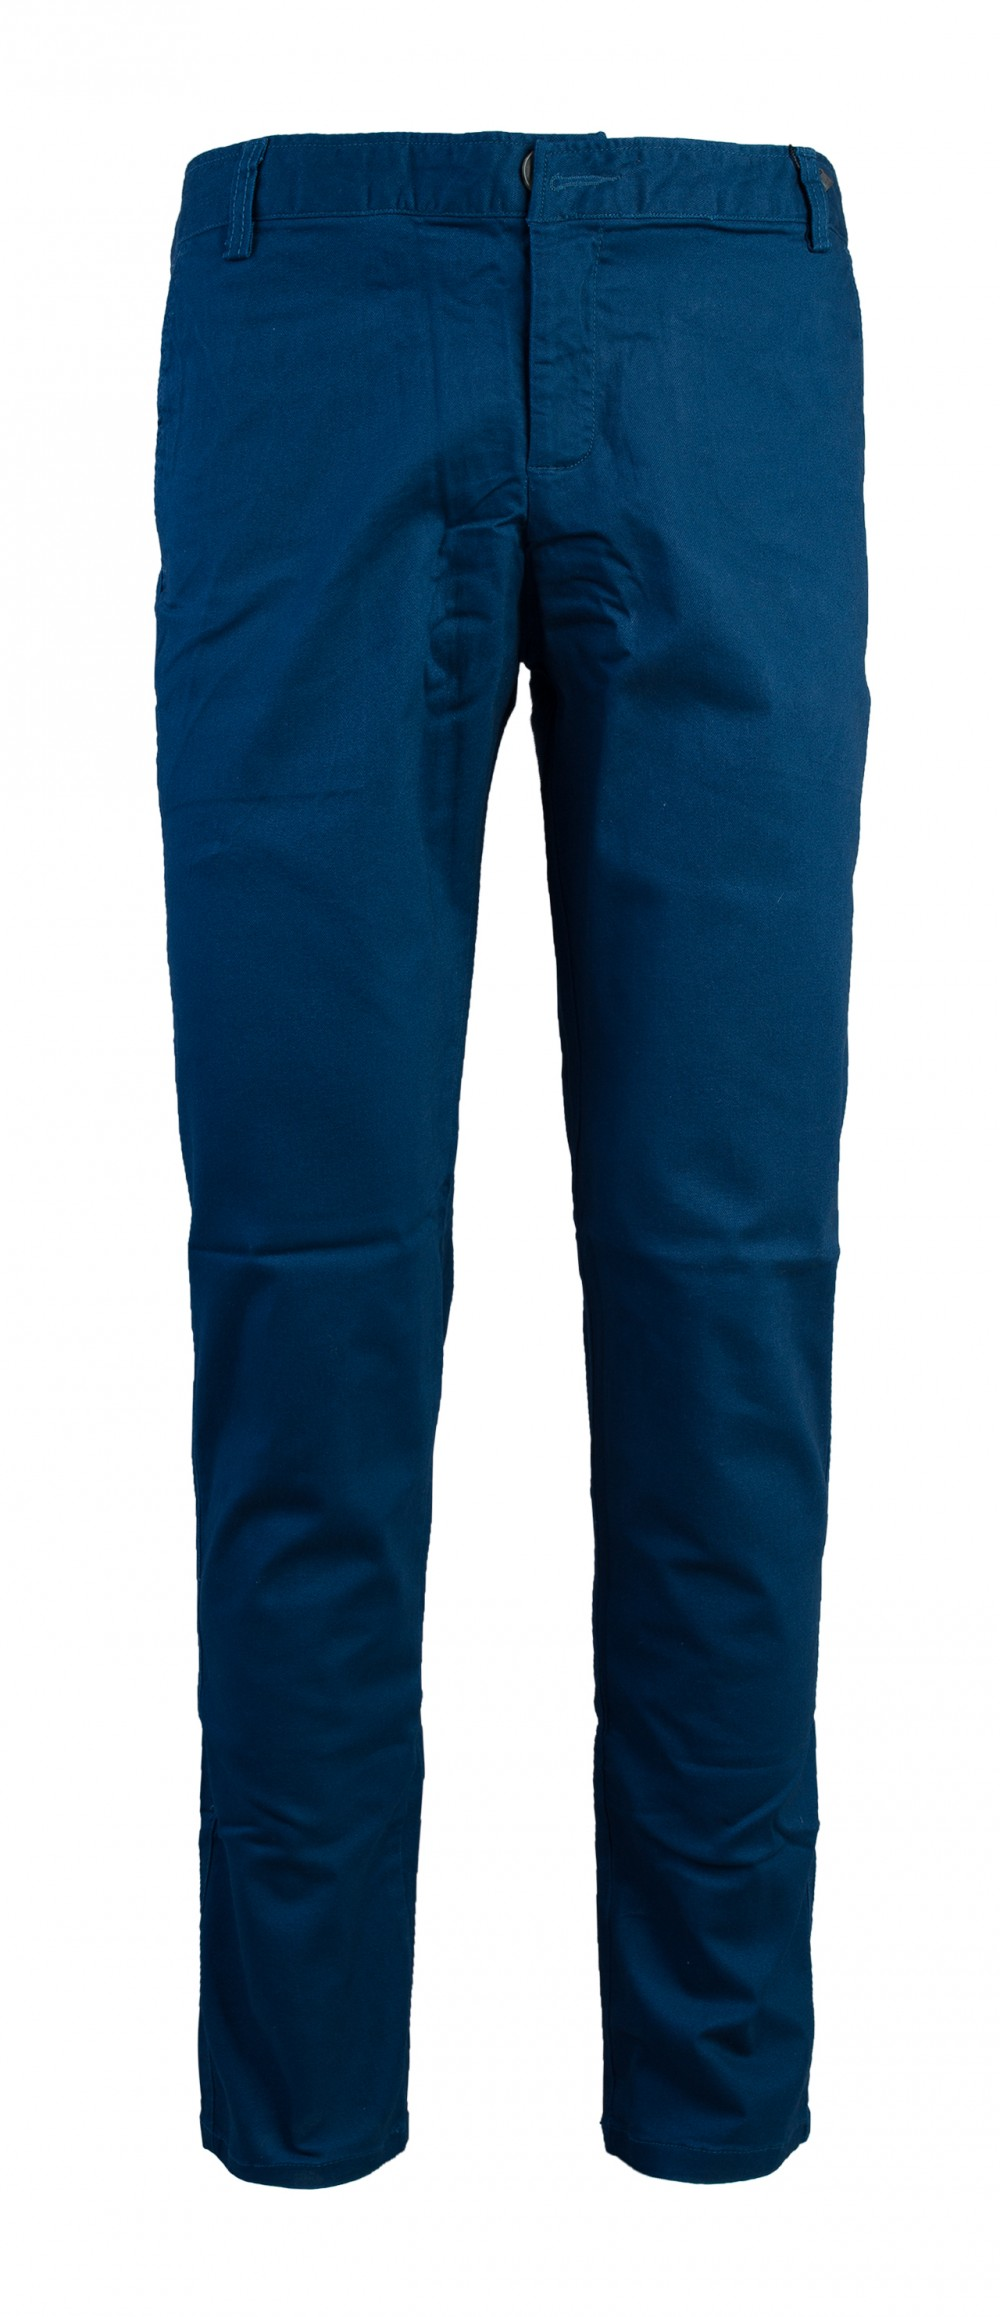 Quần kaki xanh cổ vịt qk167 - 1